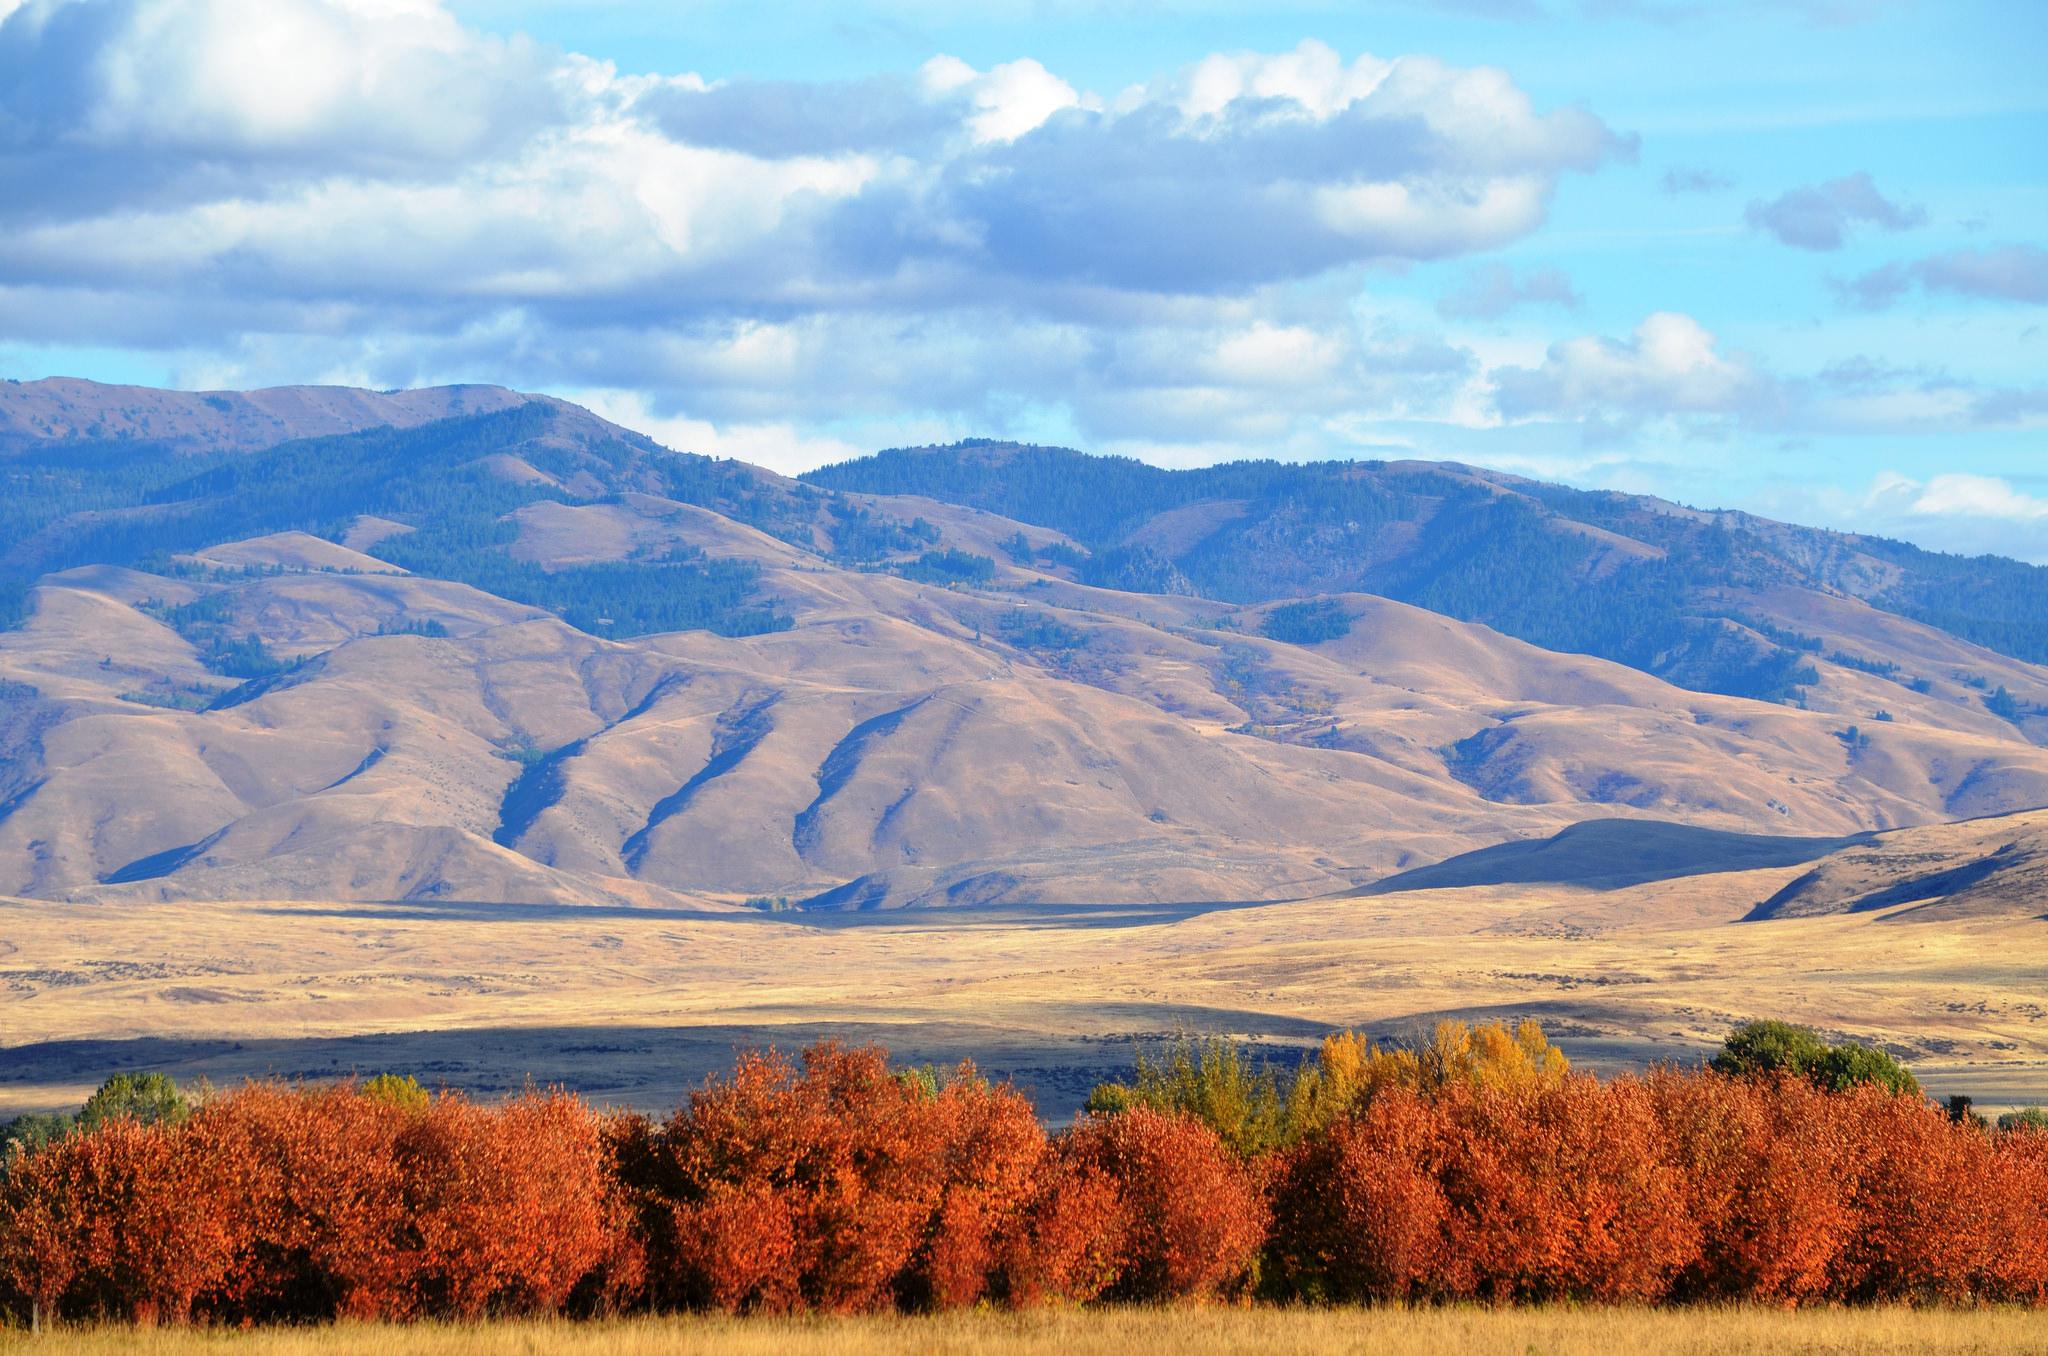 Baker County Tourism / Flickr